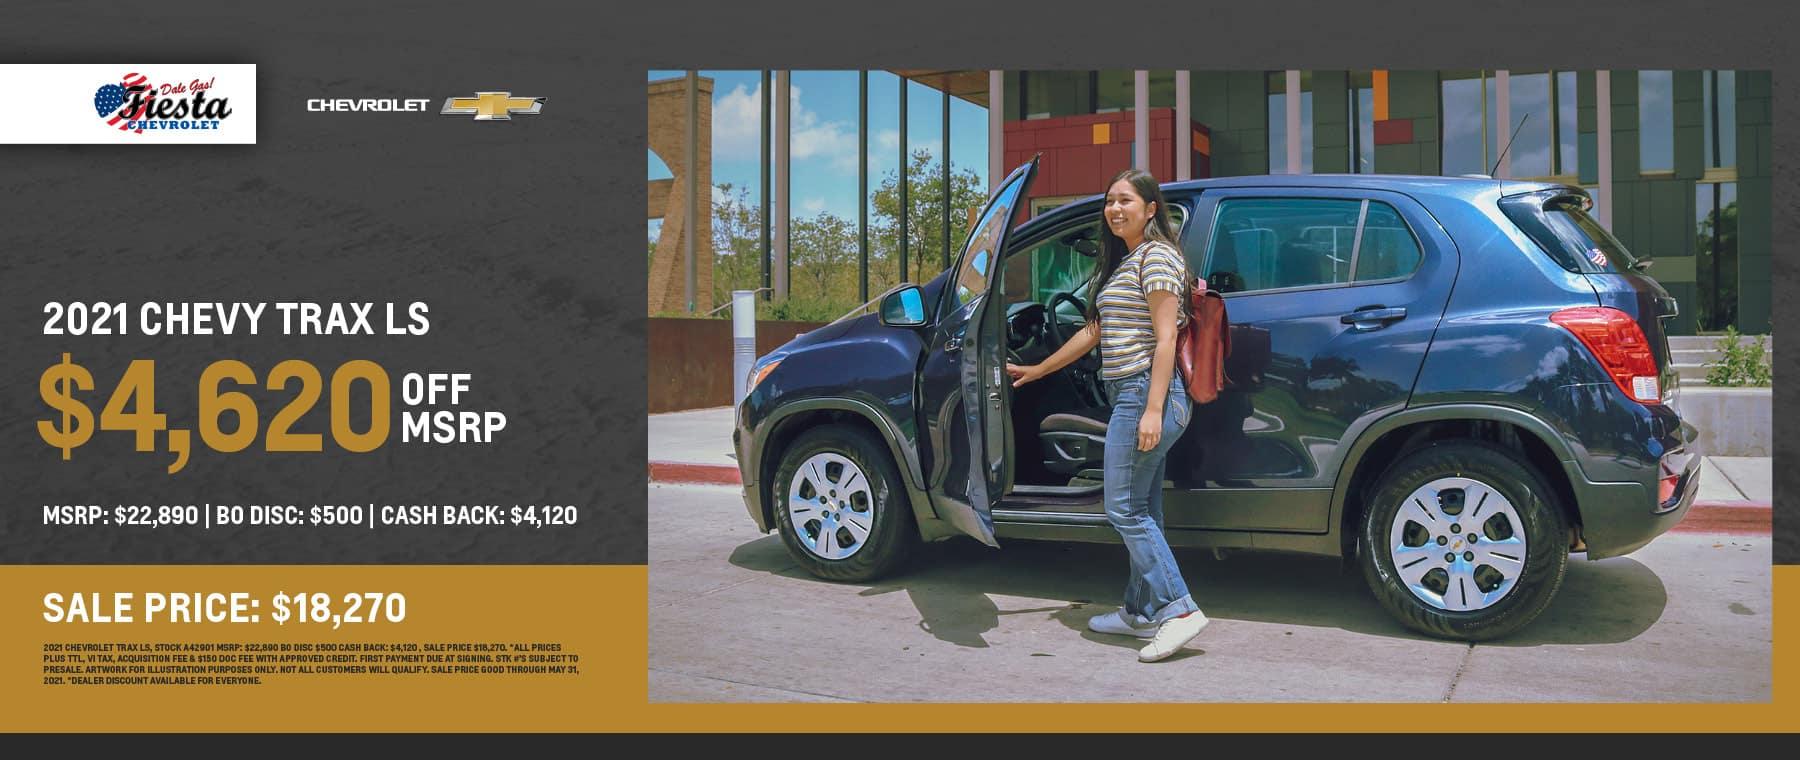 2021 Chevrolet Trax LS - Fiesta Chevrolet in Edinburg, Texas